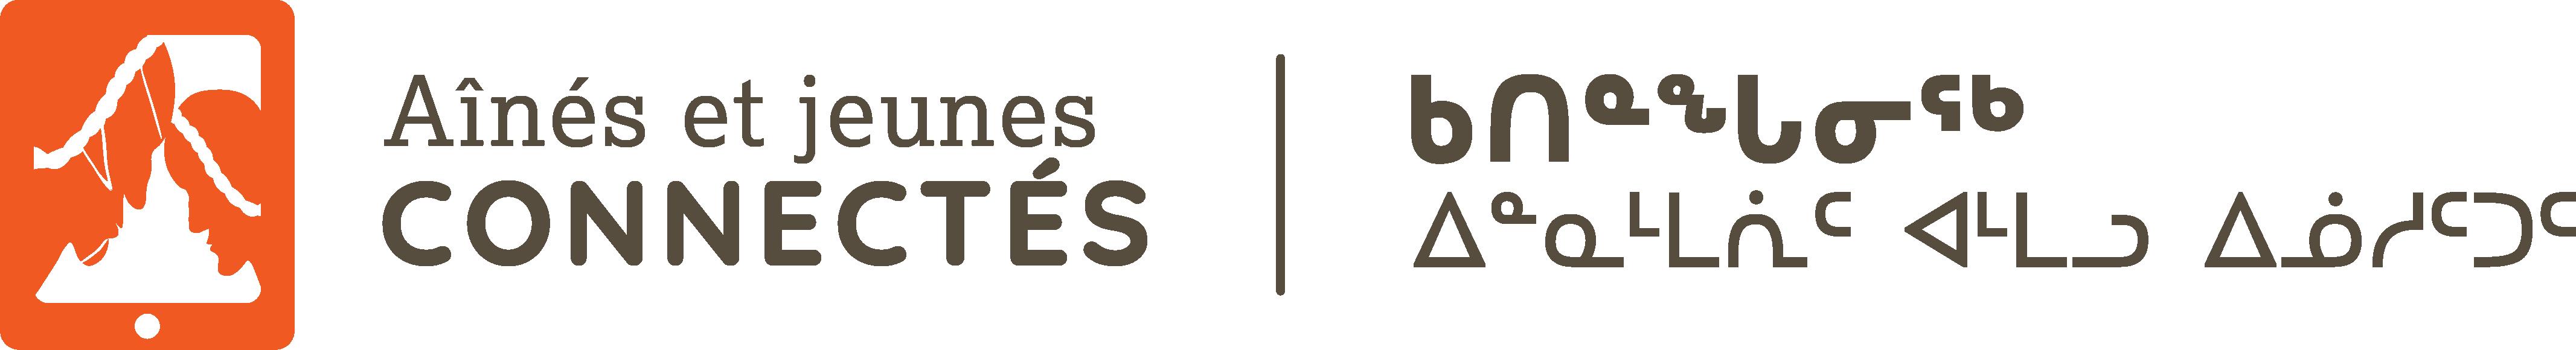 logo-connectedelders-horizontal-colour-french-web.eps